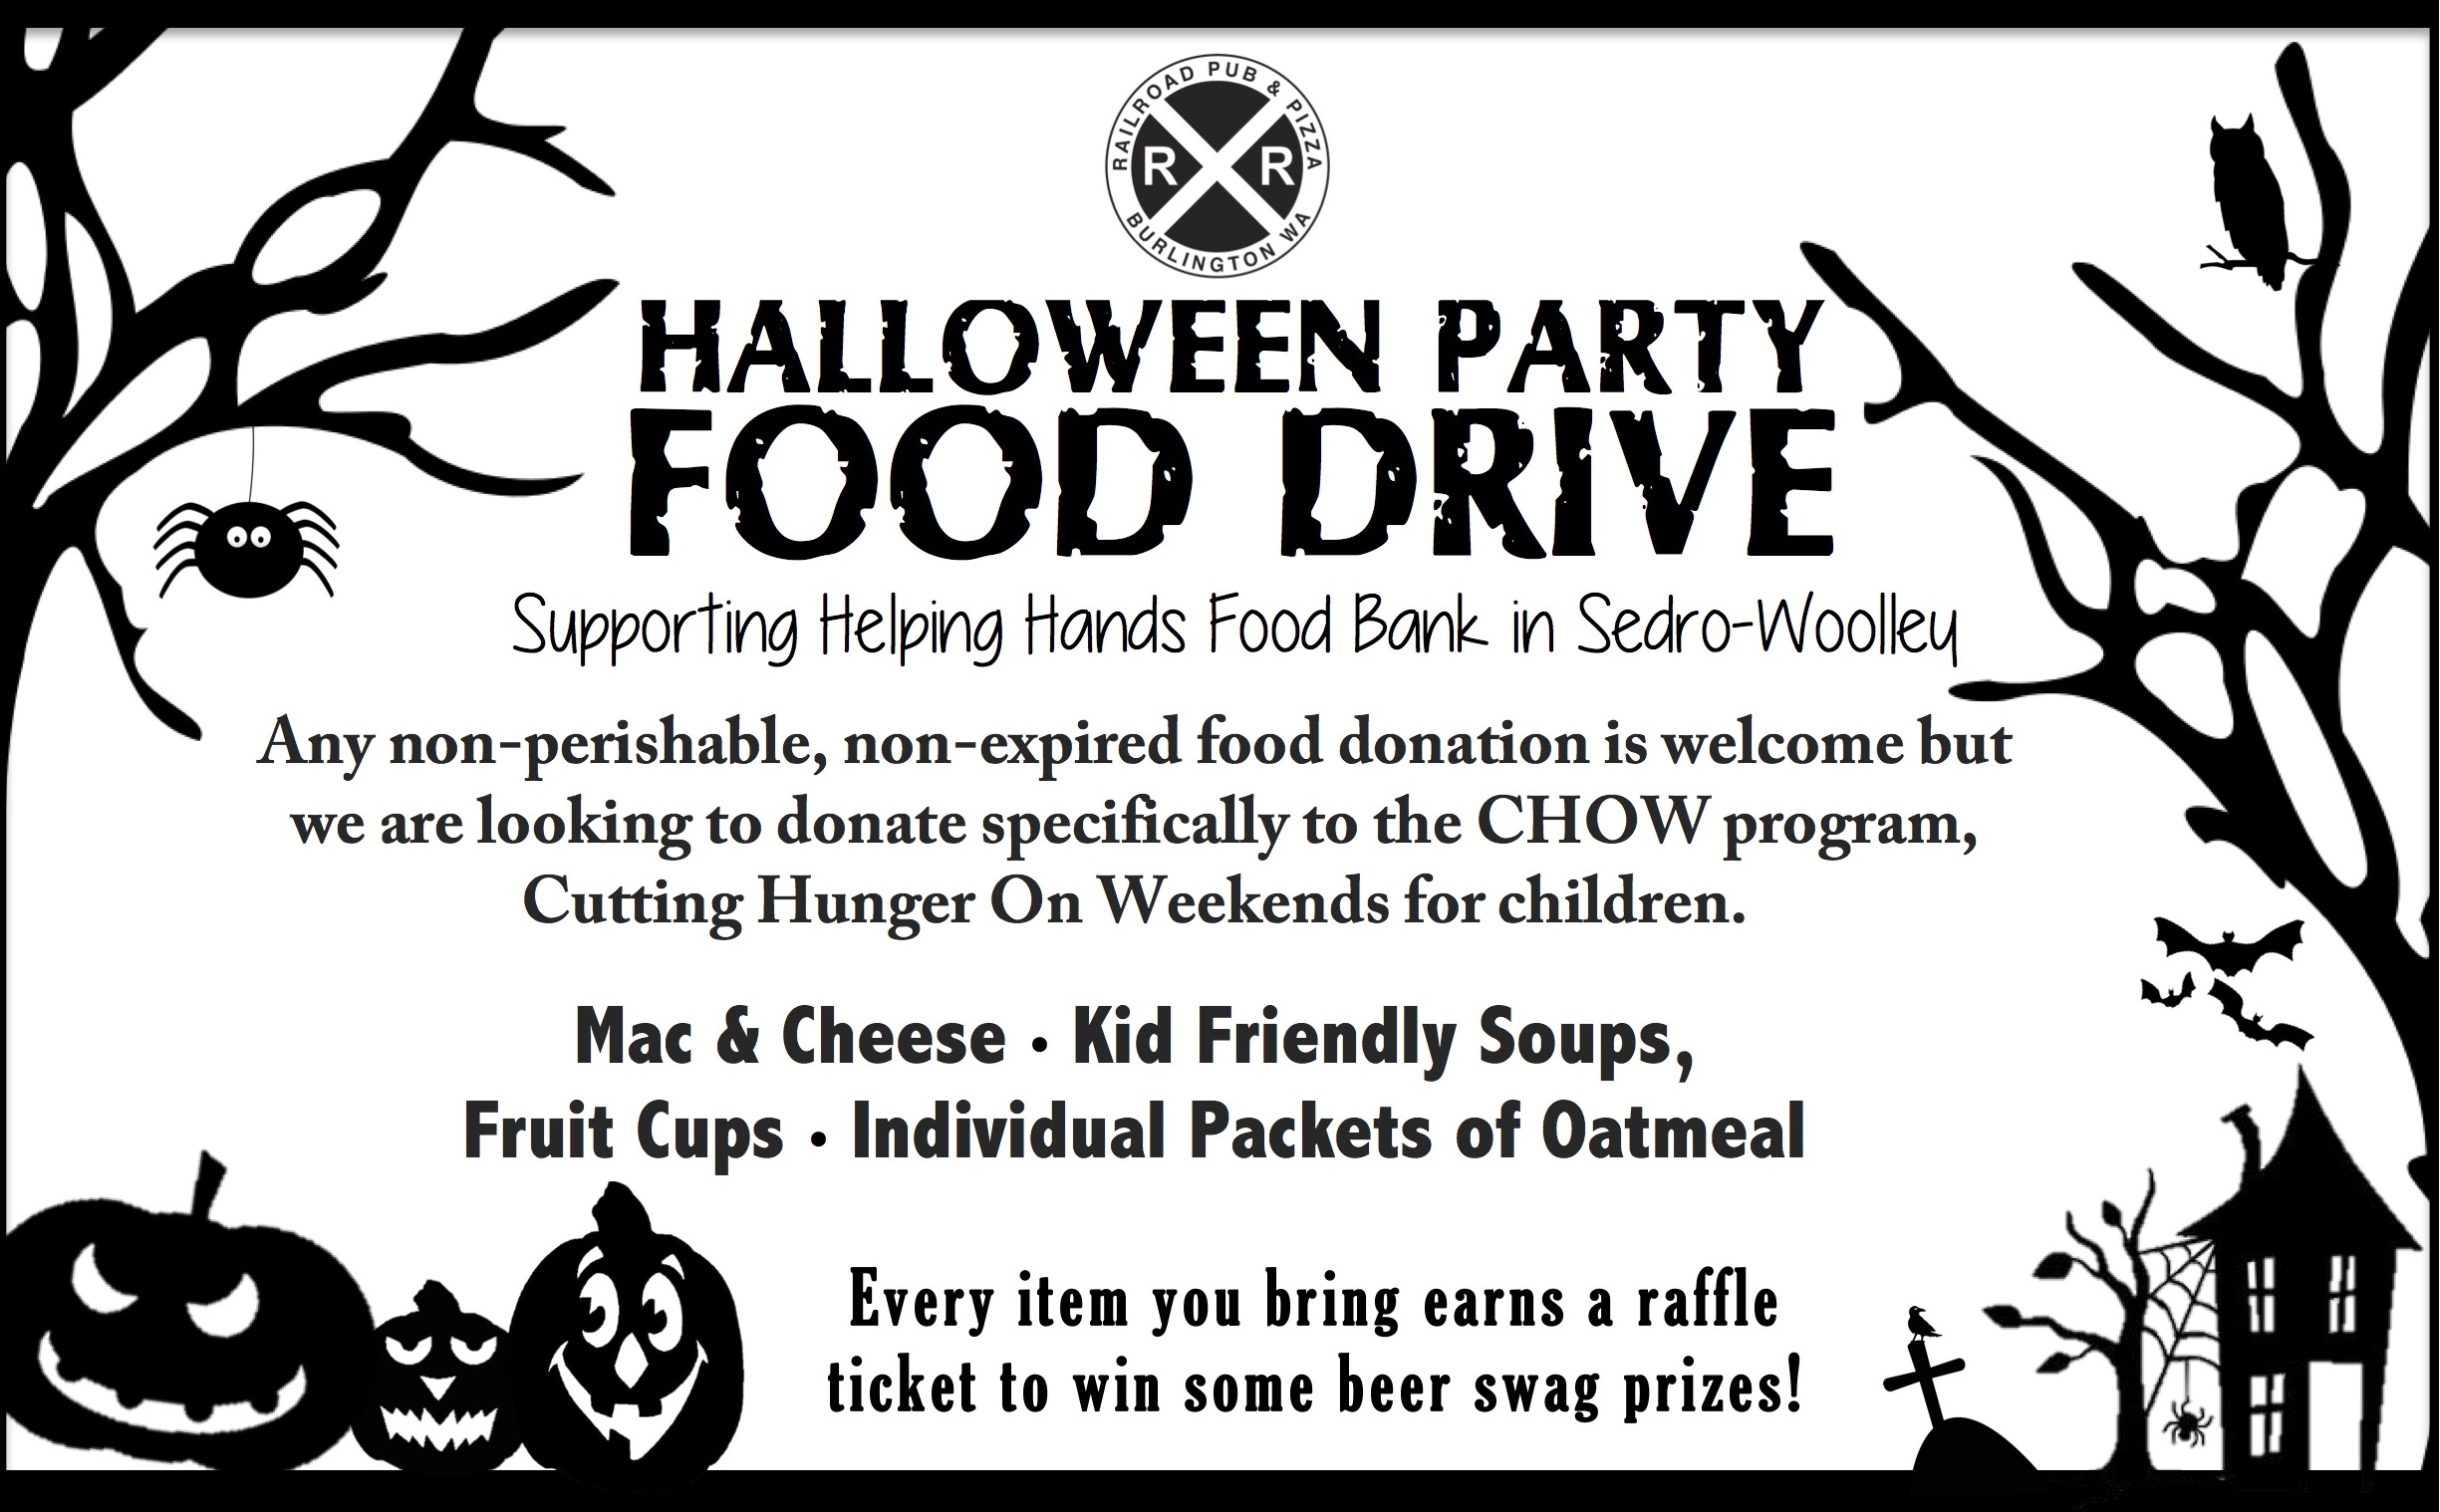 Railroad Halloween Food Drive.jpg